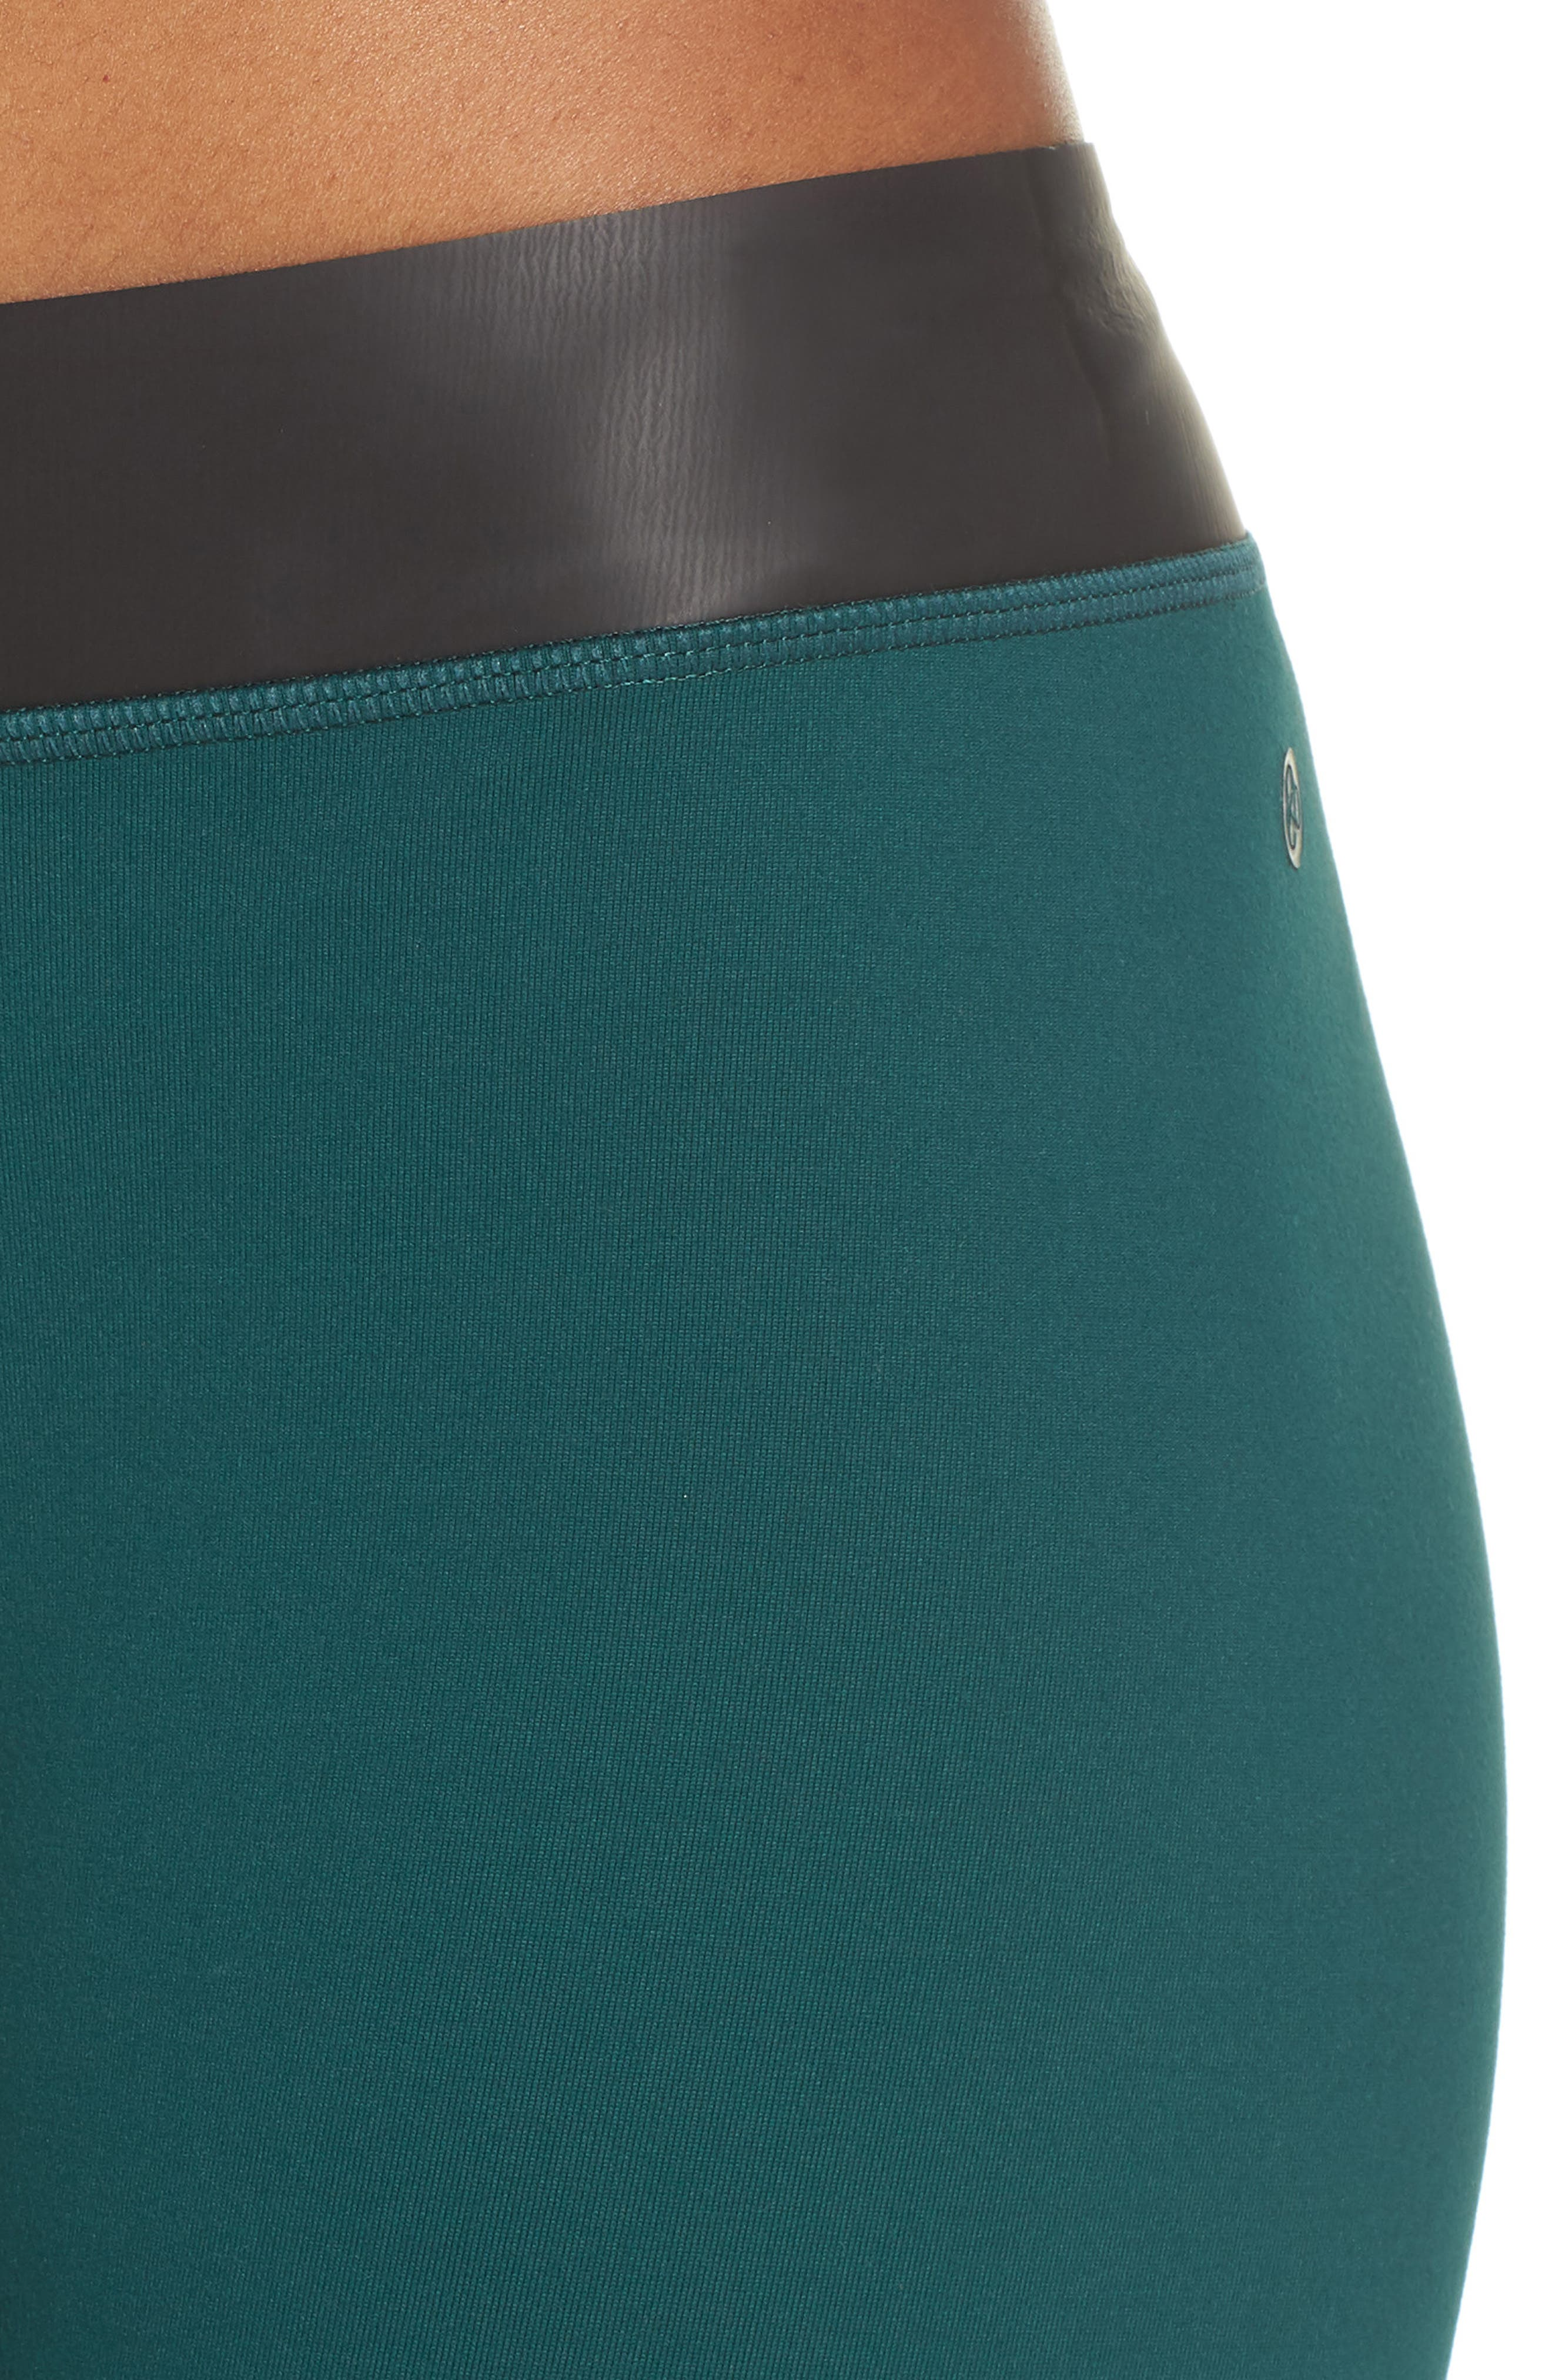 Neo Banded Crop Leggings,                             Alternate thumbnail 4, color,                             Green Bug